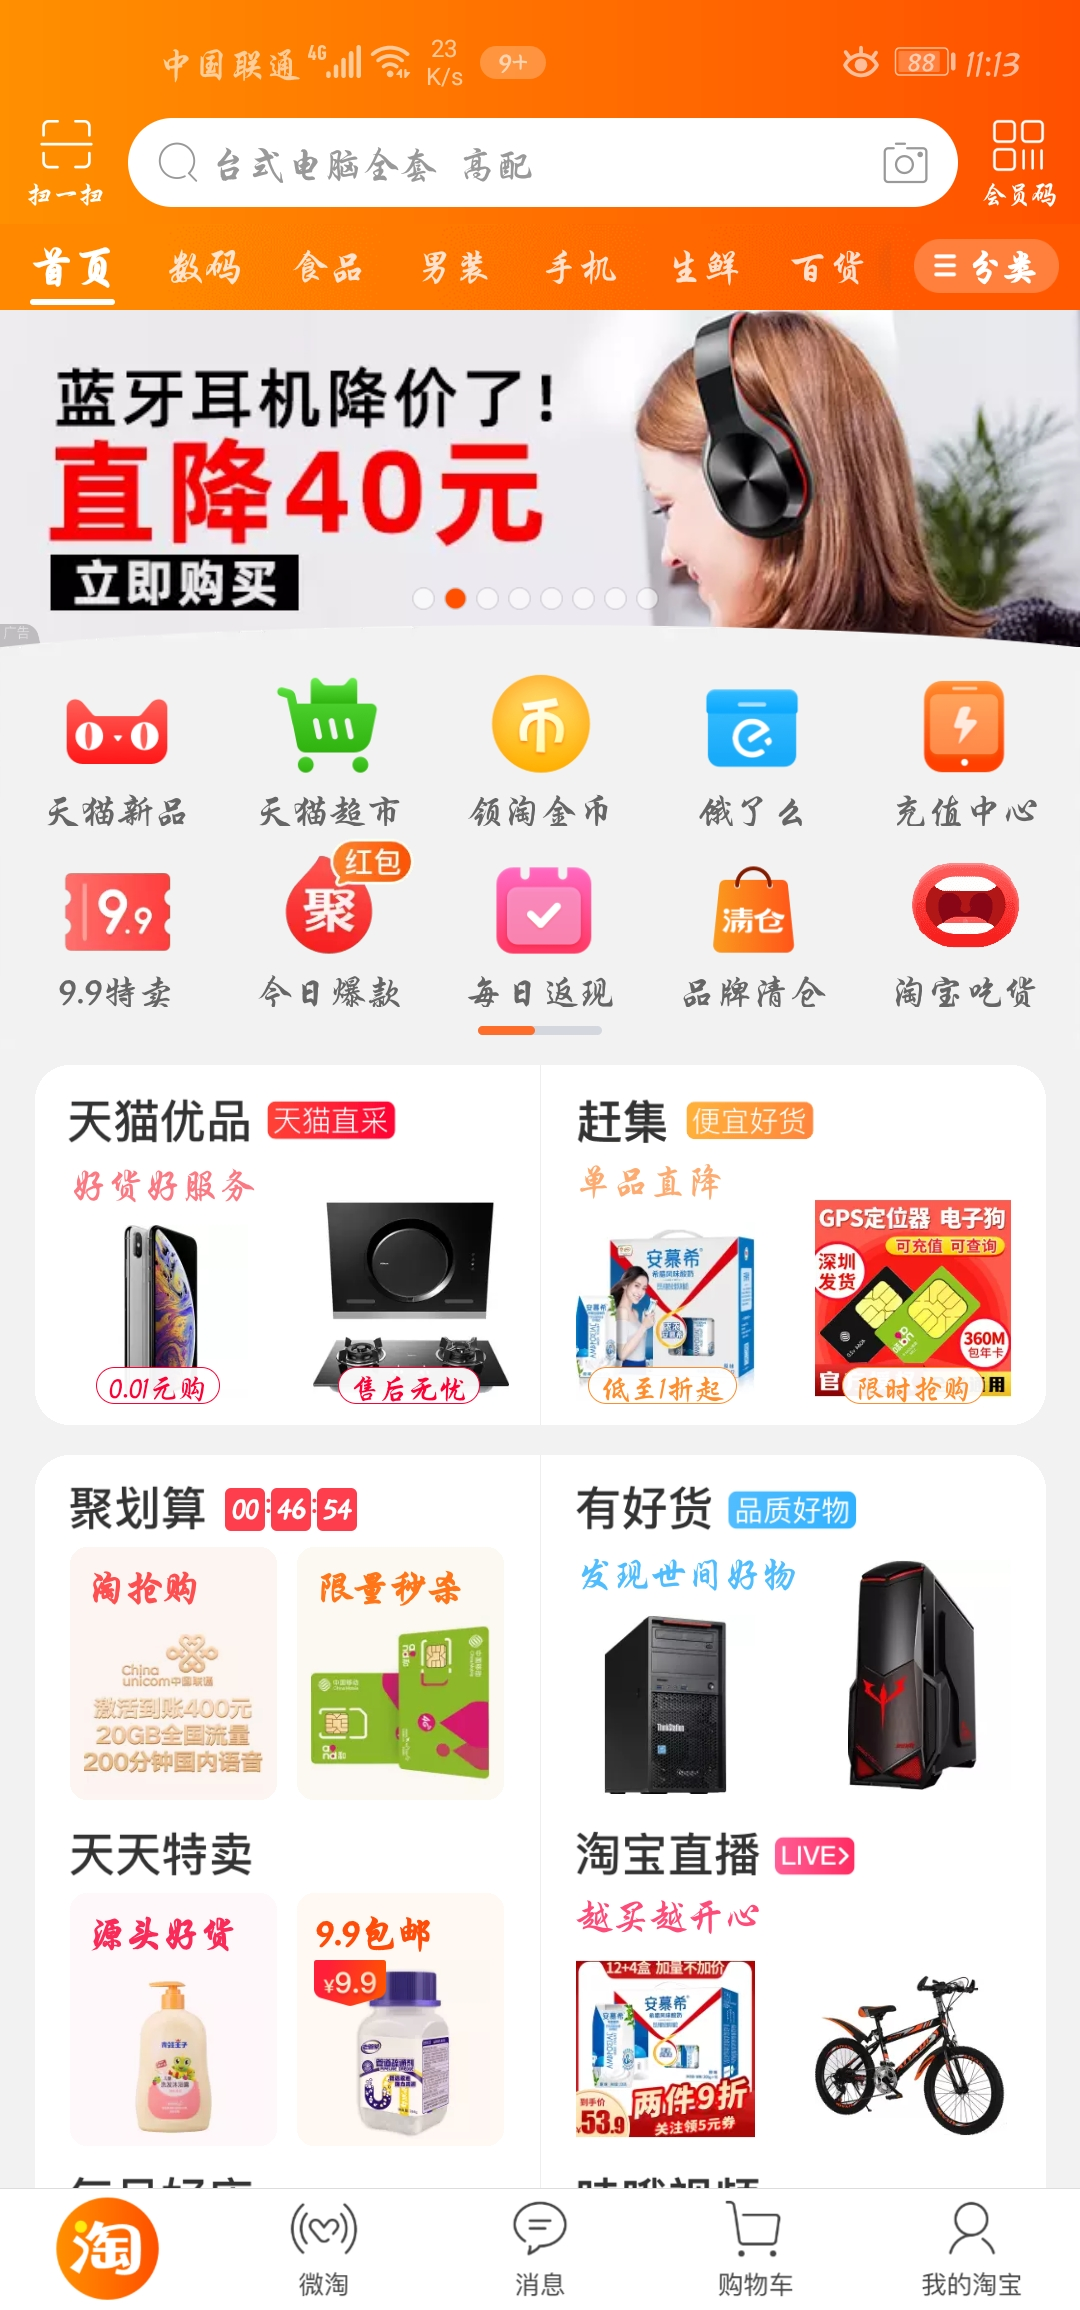 Screenshot_20190803_111304_com.taobao.taobao.jpg